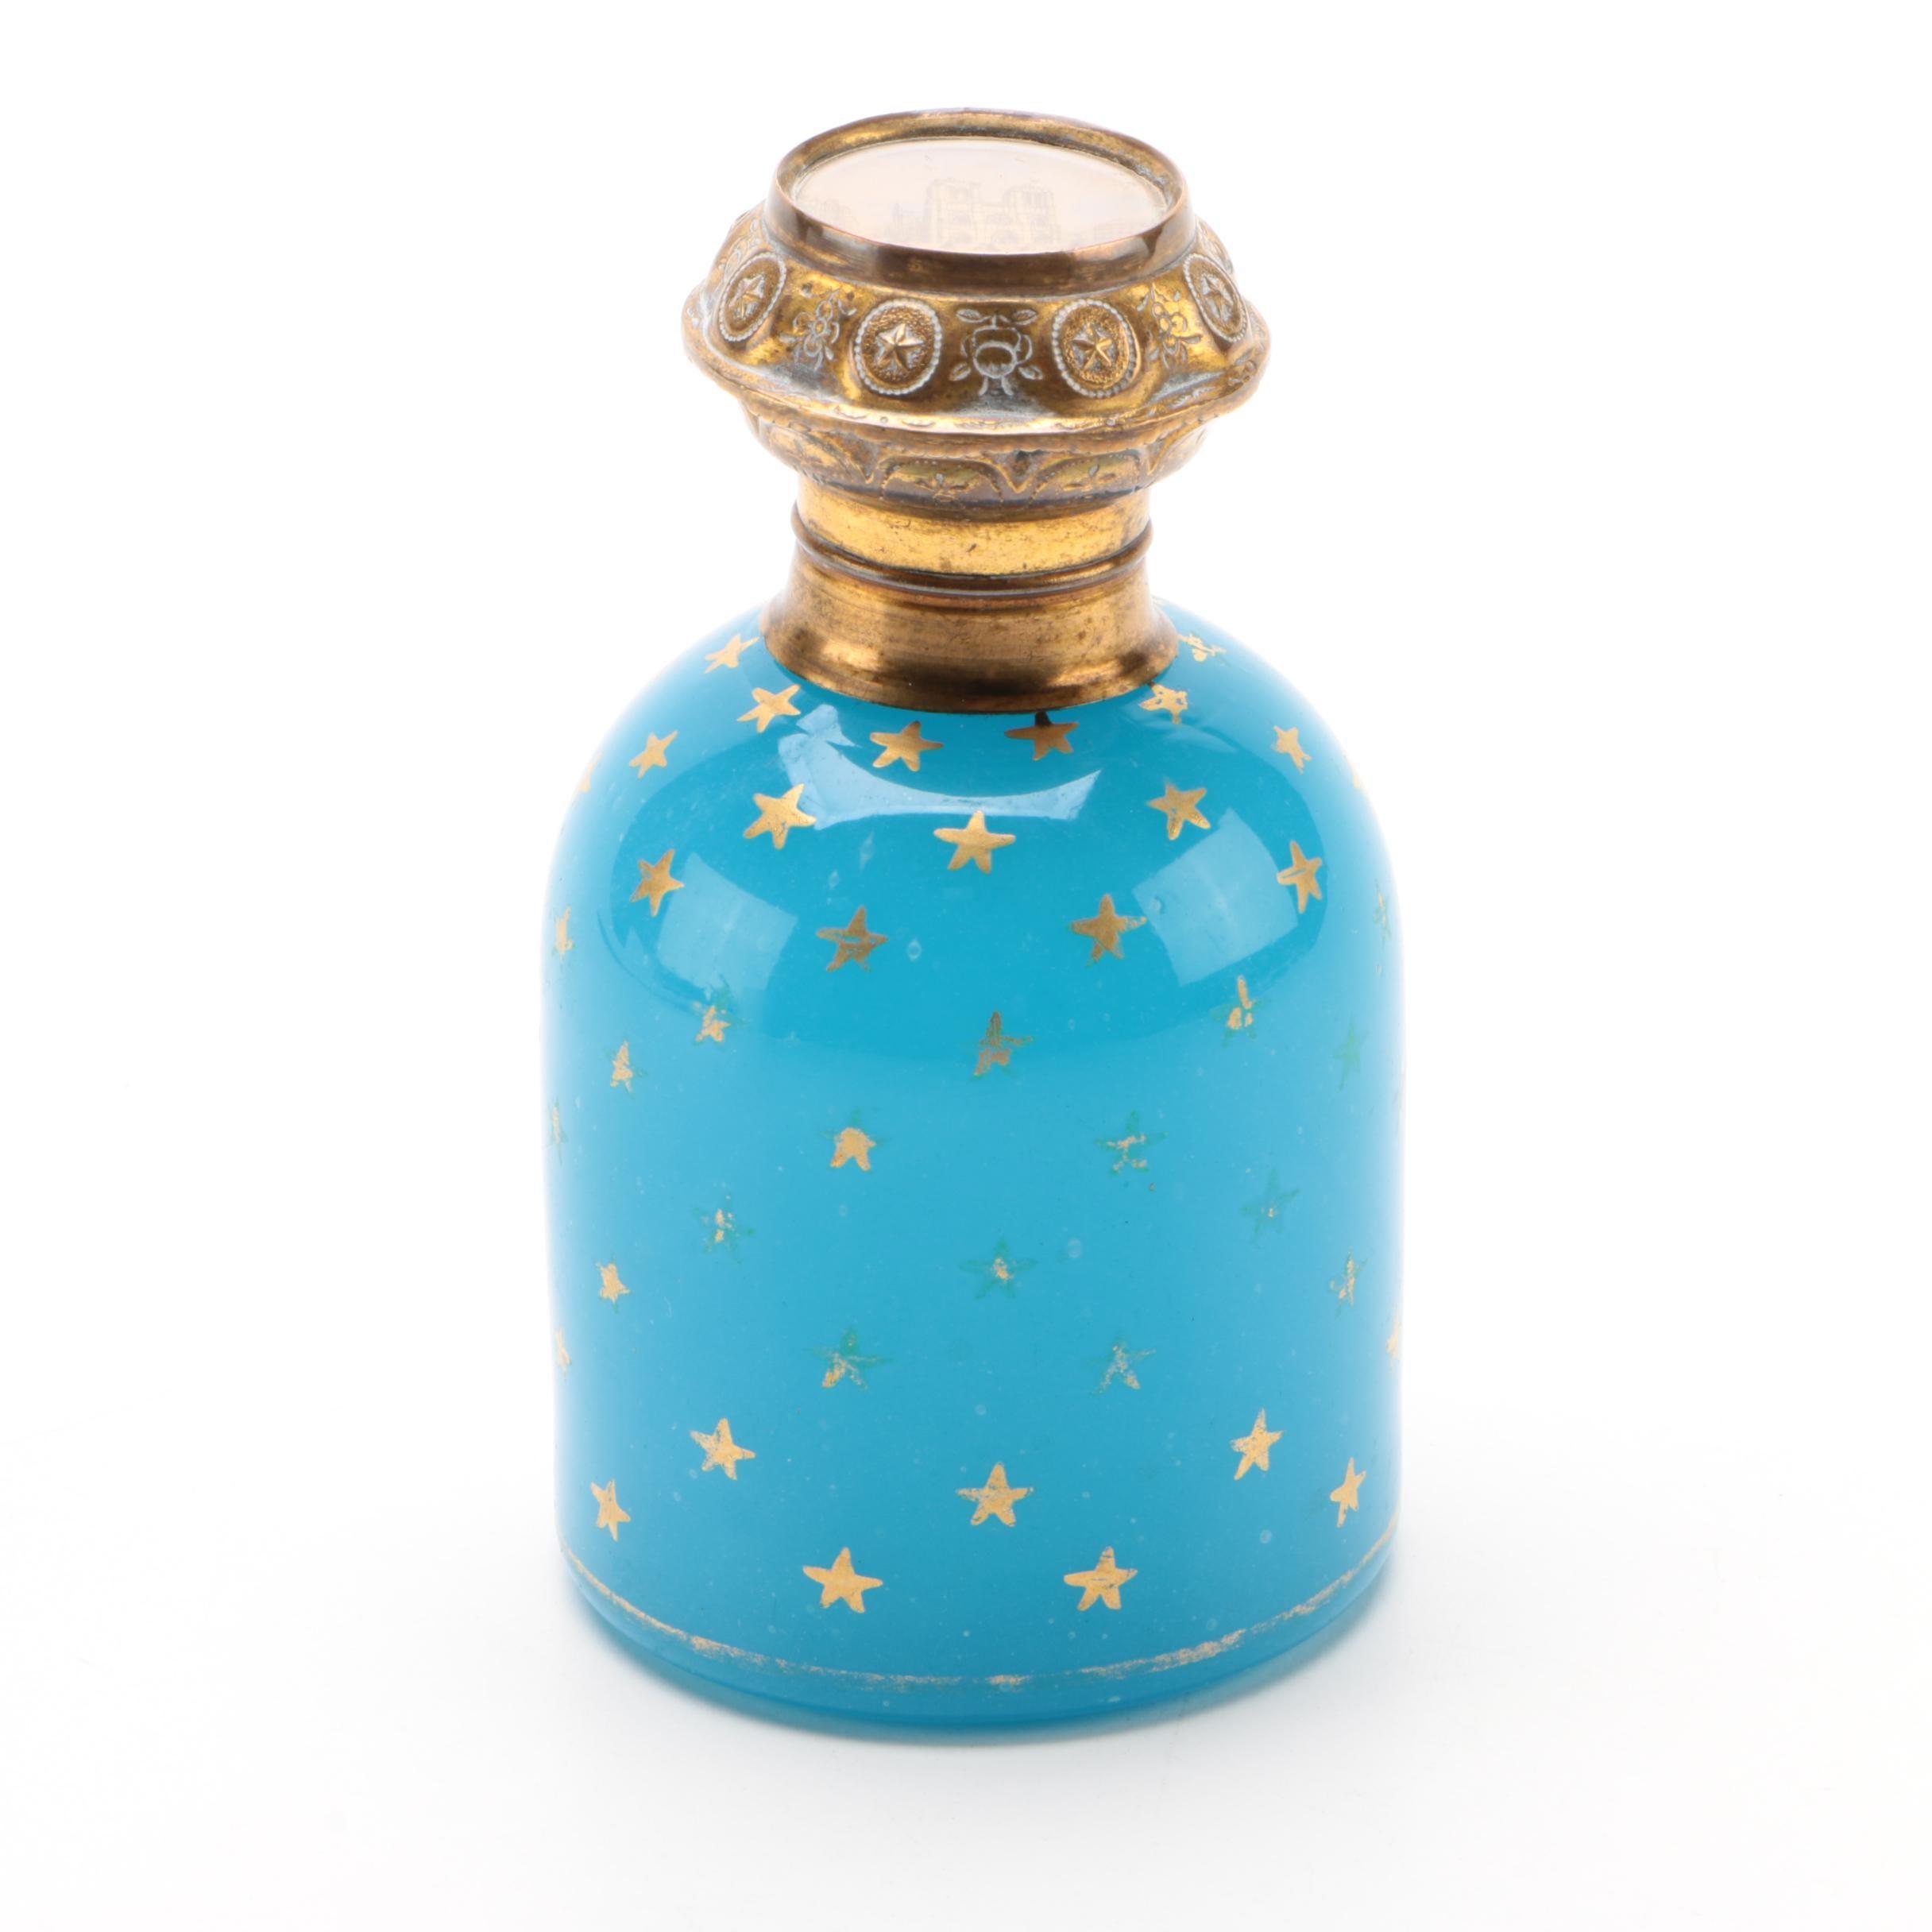 Parisian Blue Opaline Glass Perfume Bottle with Notre-Dame Lithograph Lid